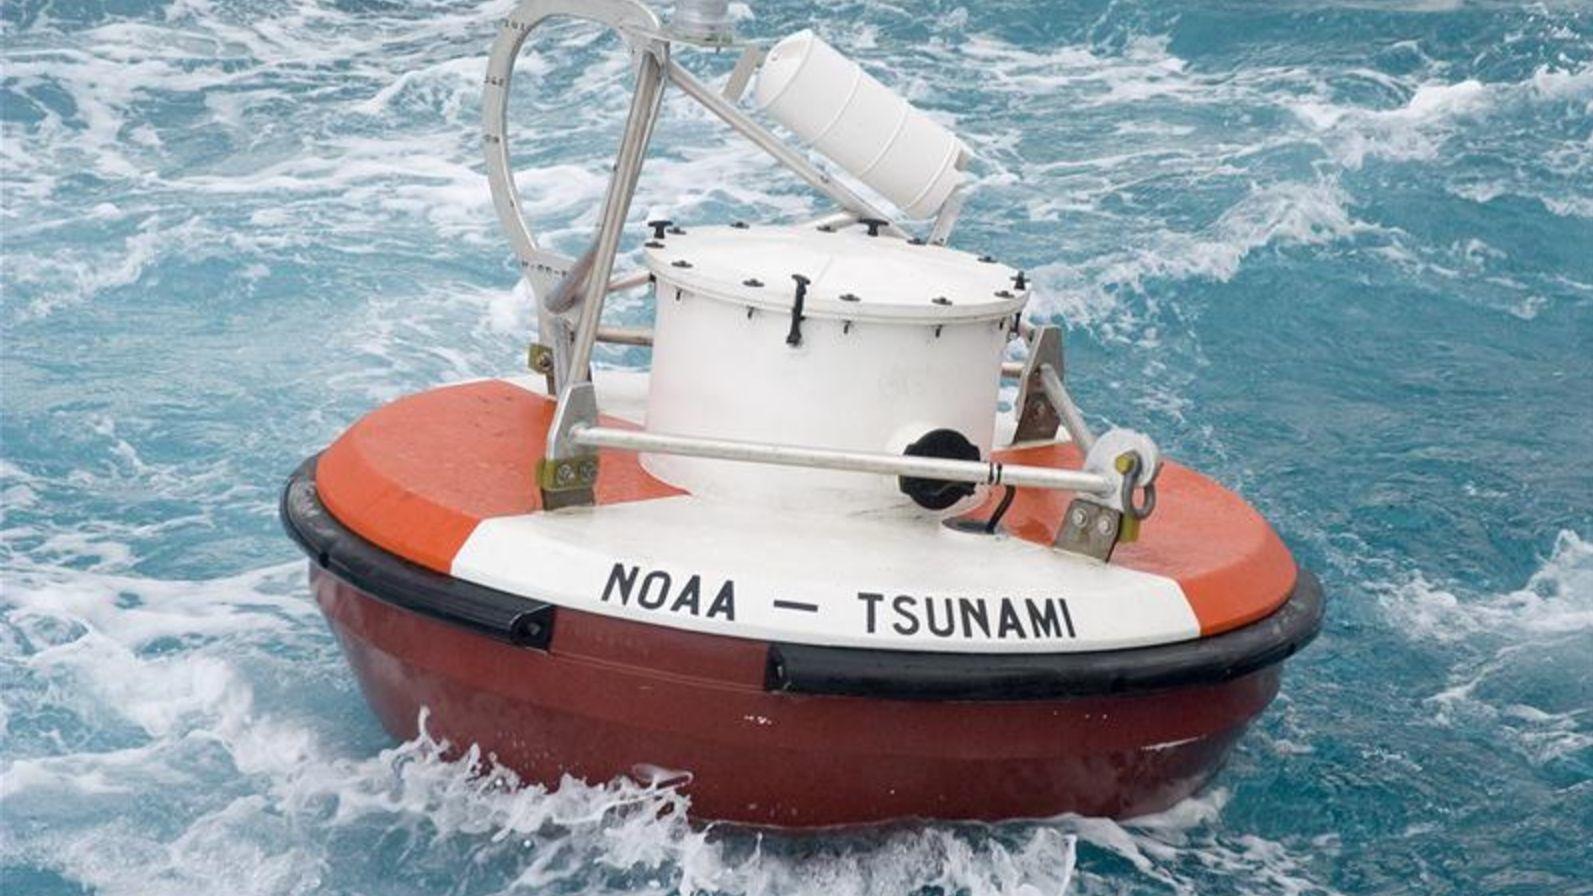 A tsunami buoy.